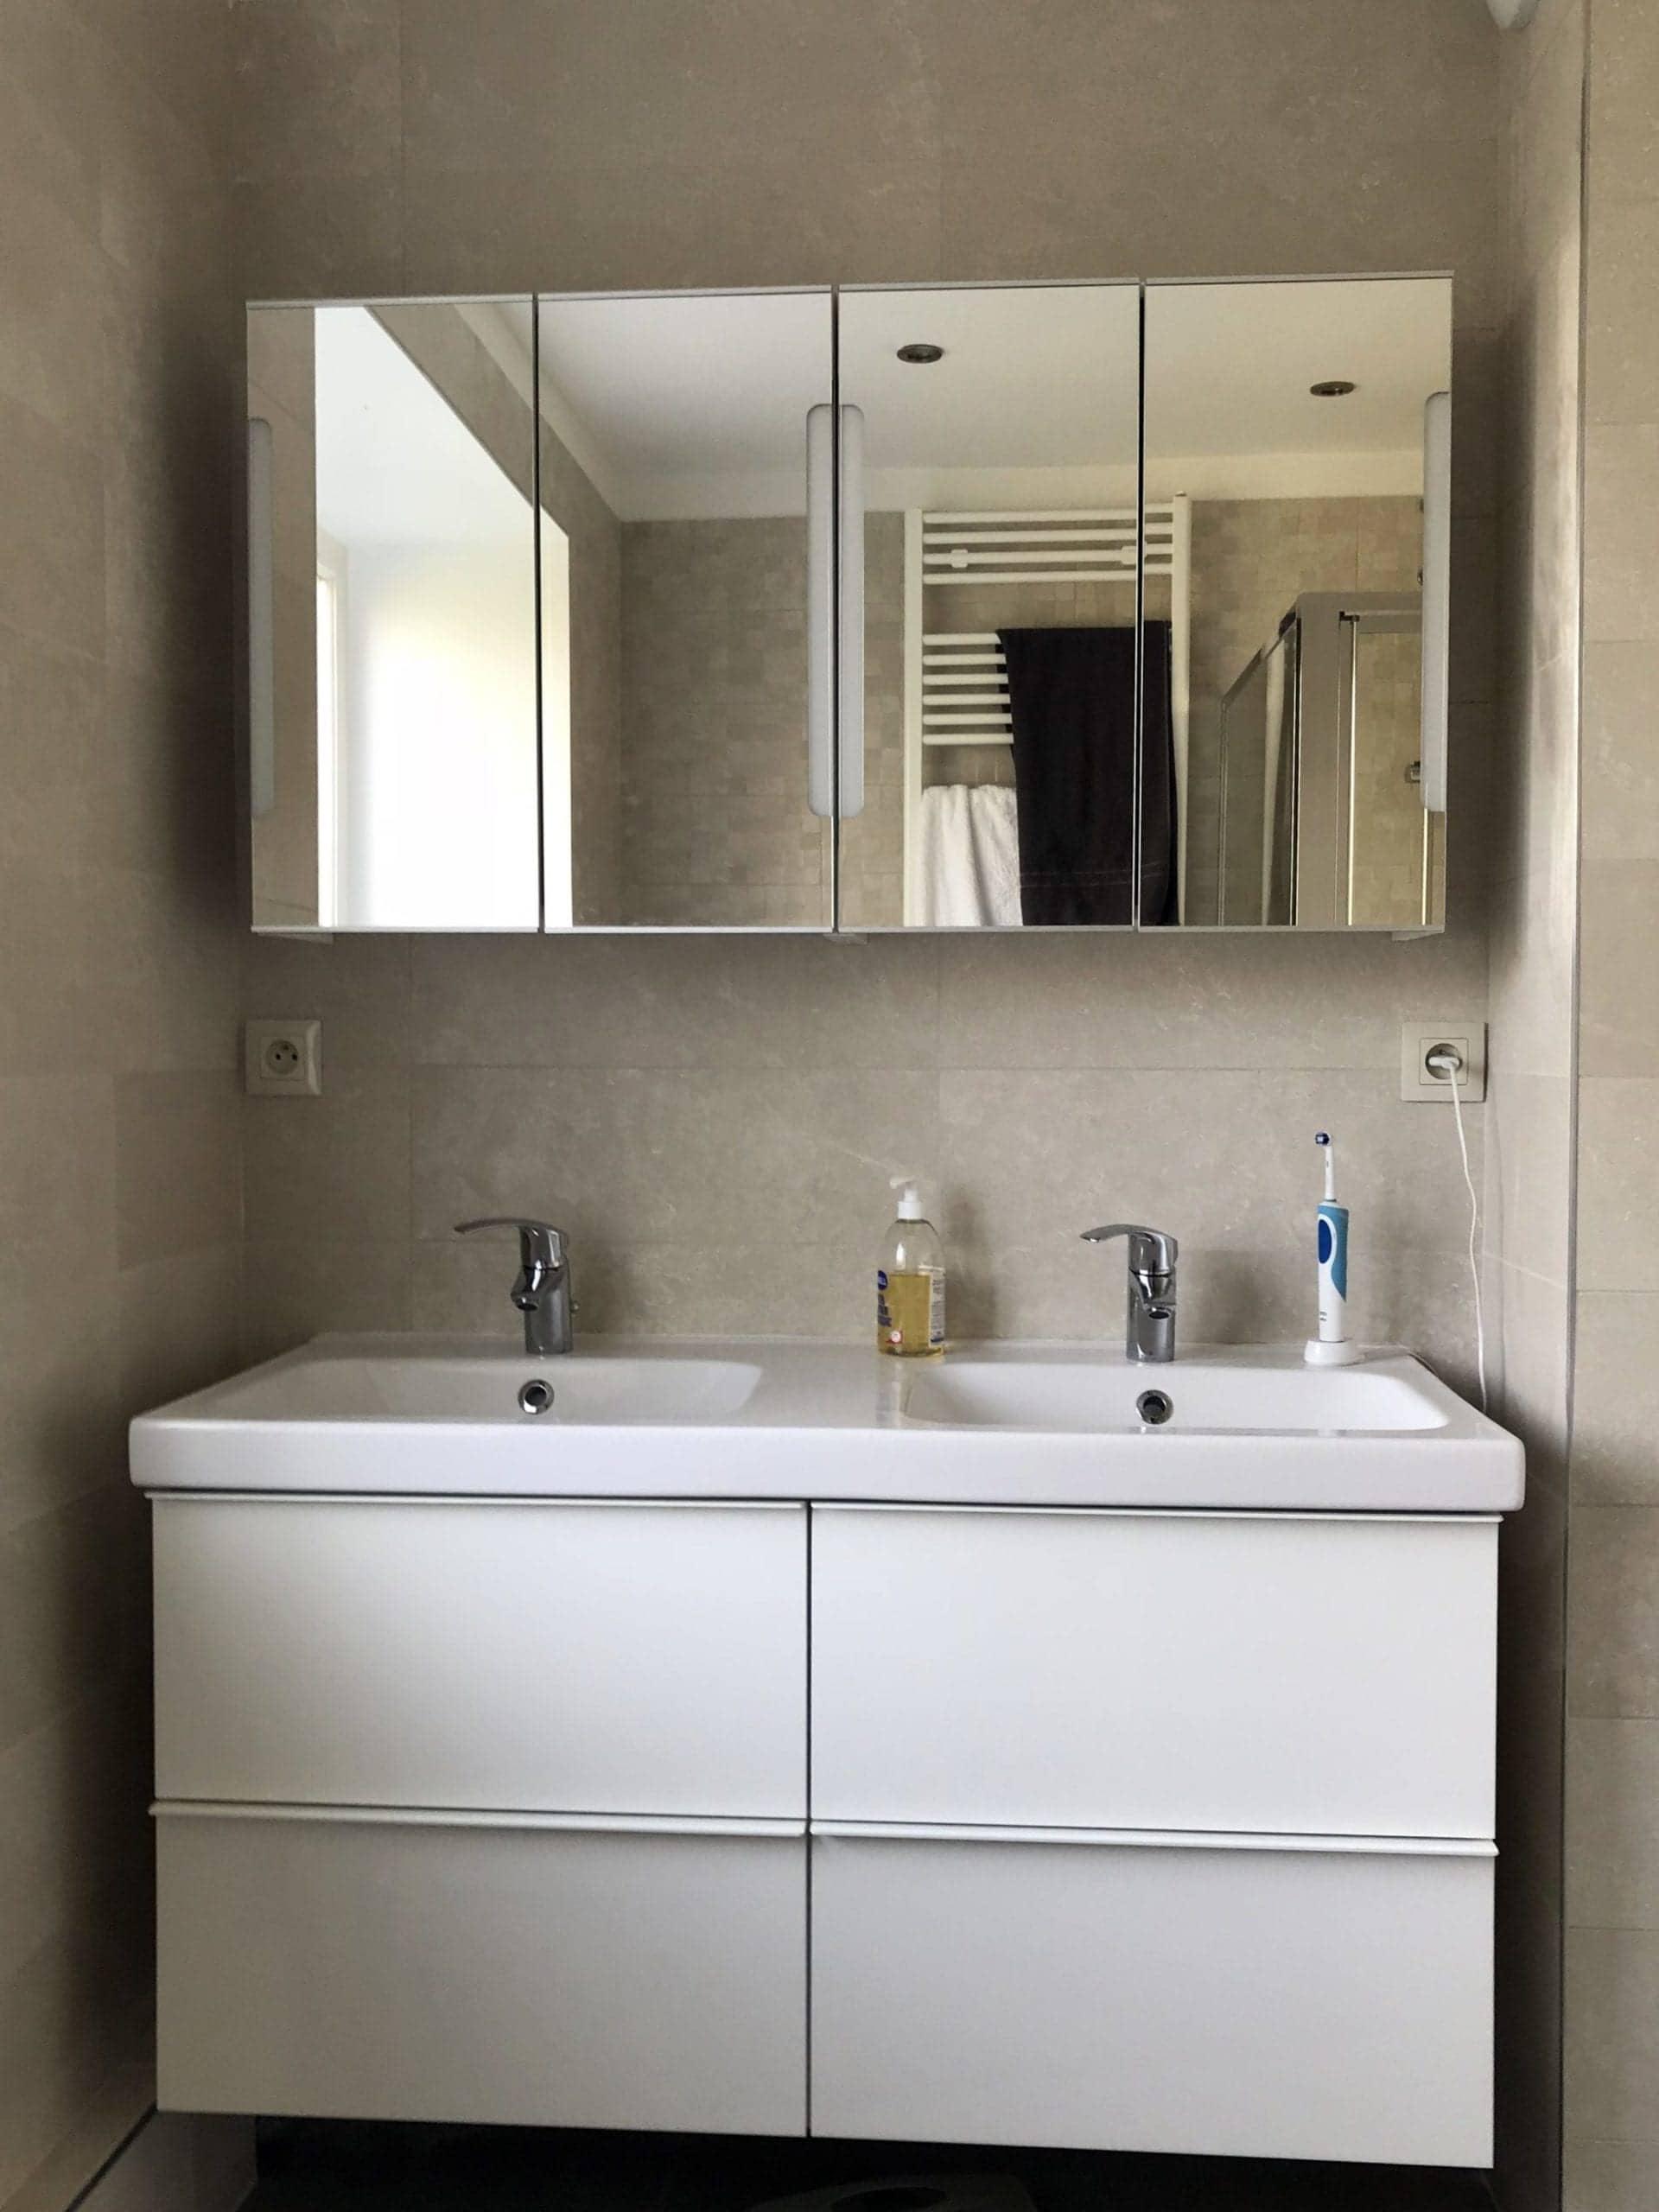 salle de bain rénovée avec meuble double vasque type IKEA